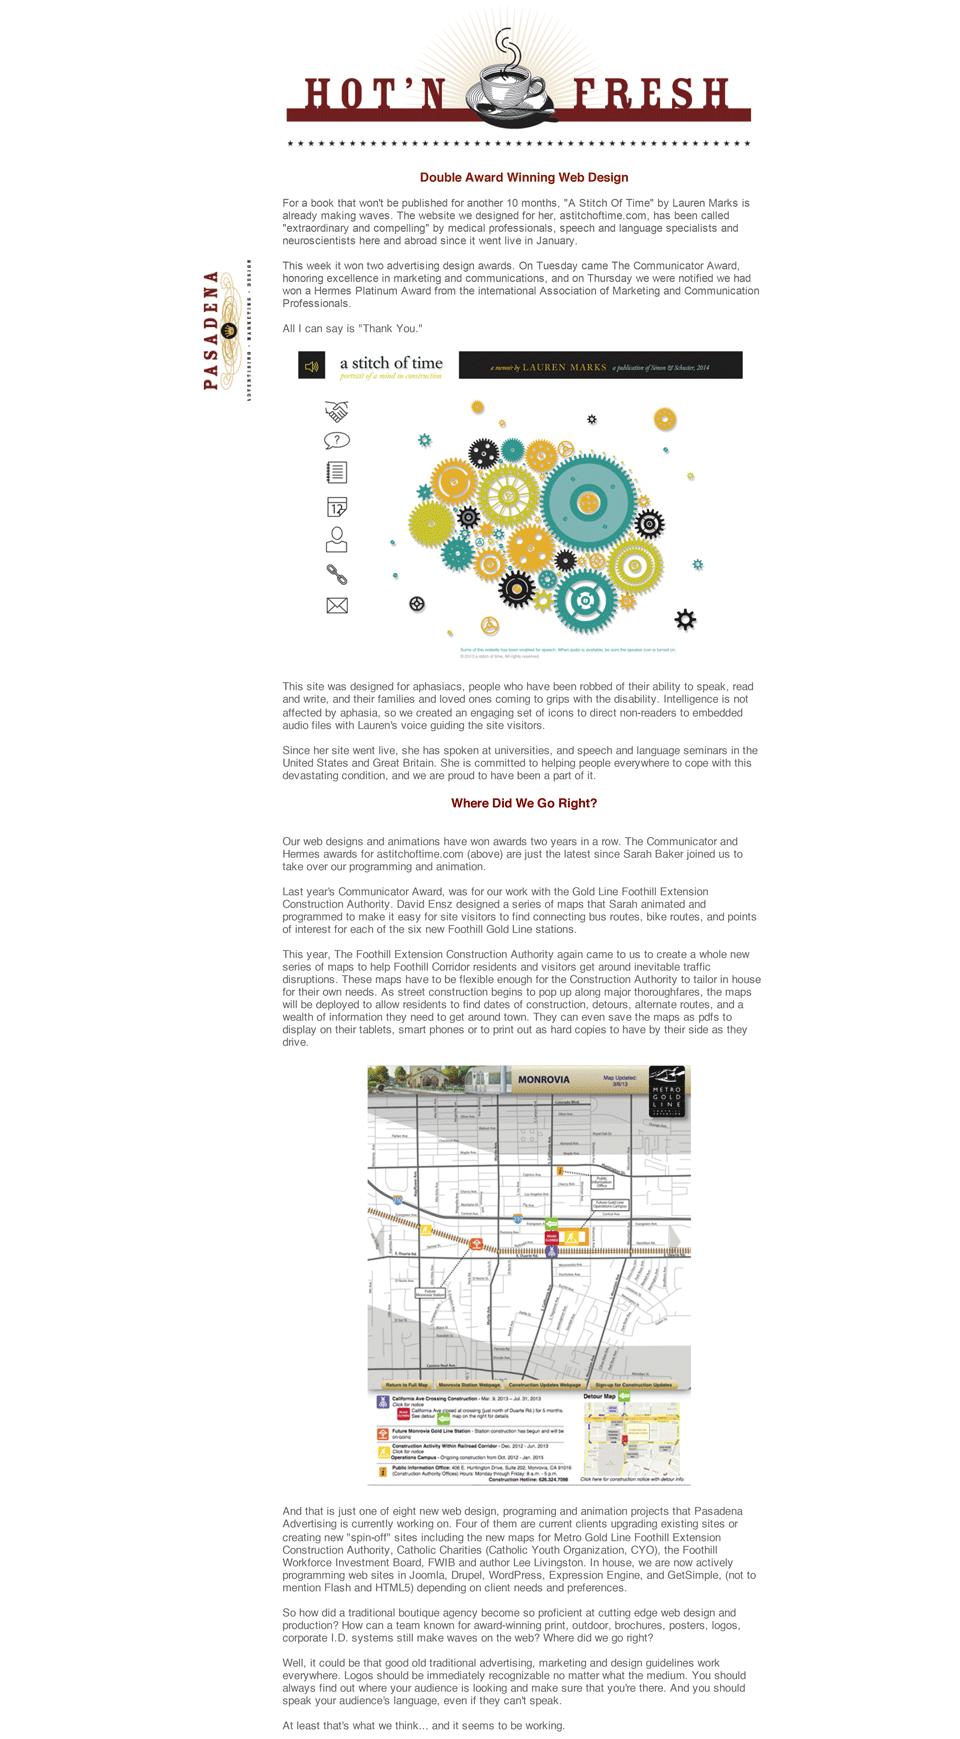 13-05-13_H&F